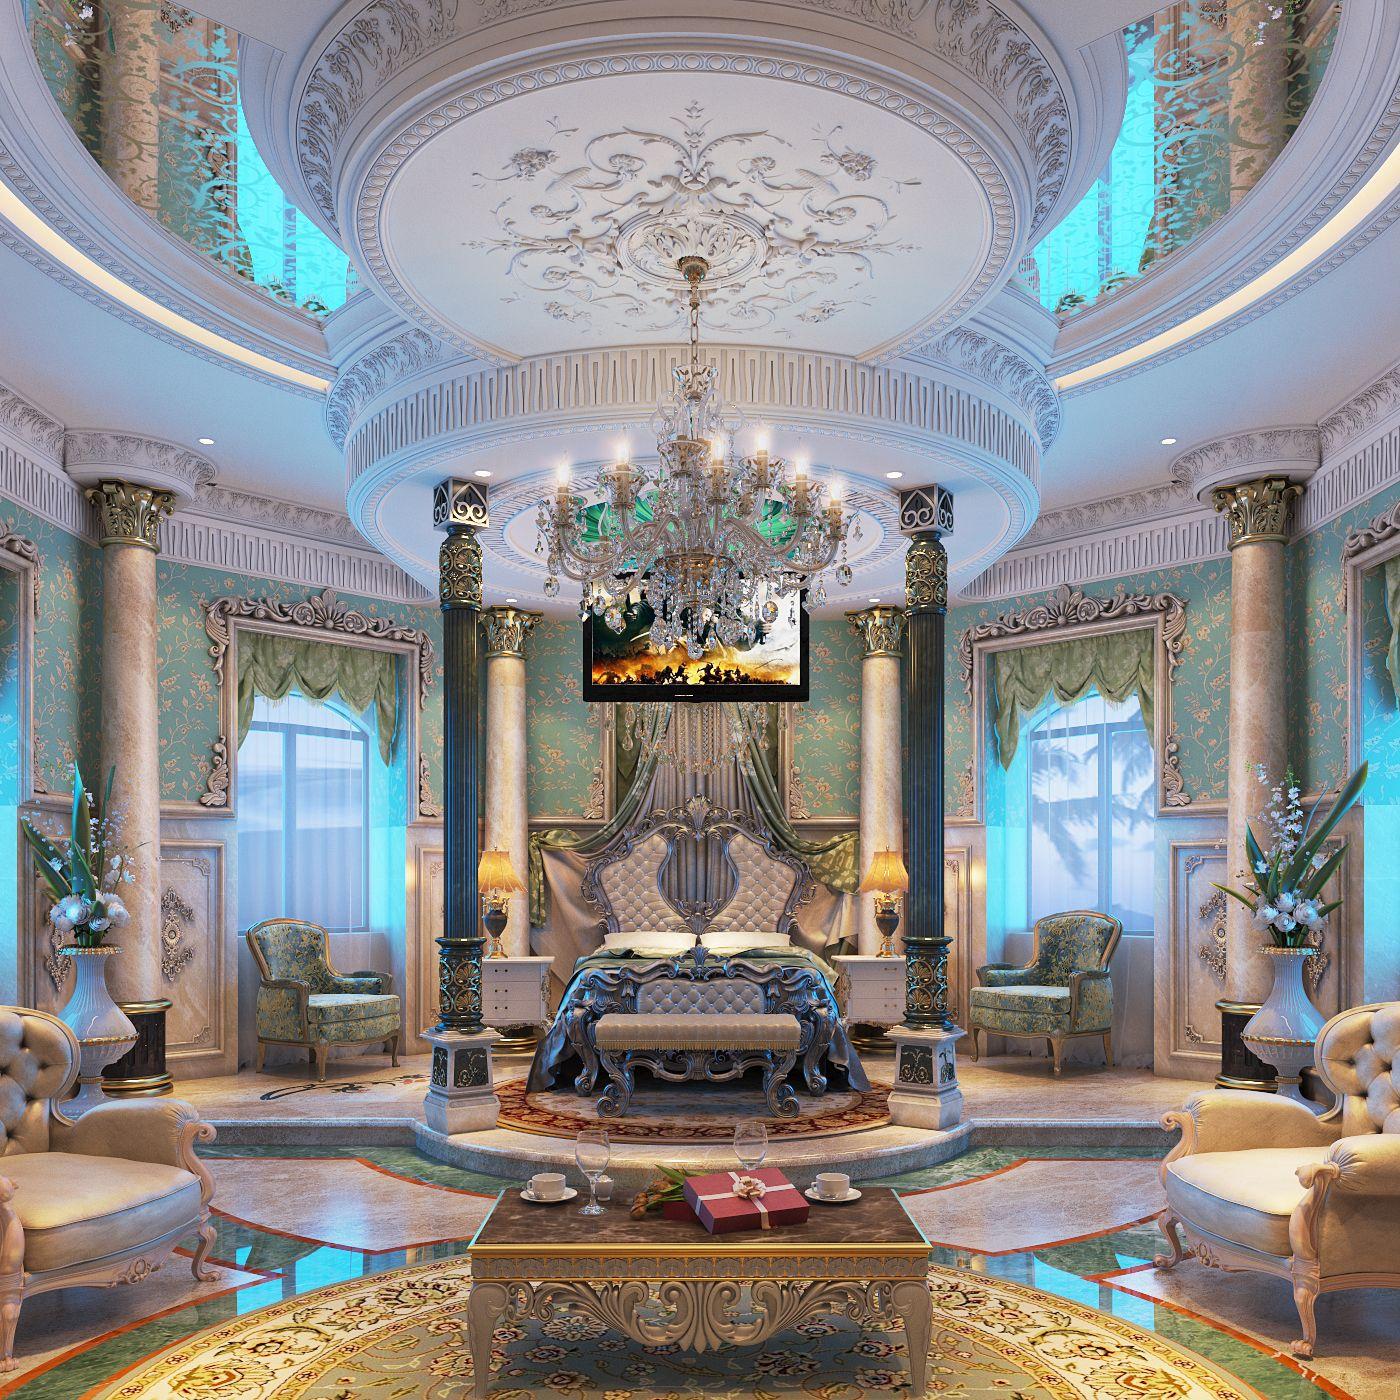 Risultati immagini per ROYAL BEDROOM | Palace | Pinterest | Royal ...